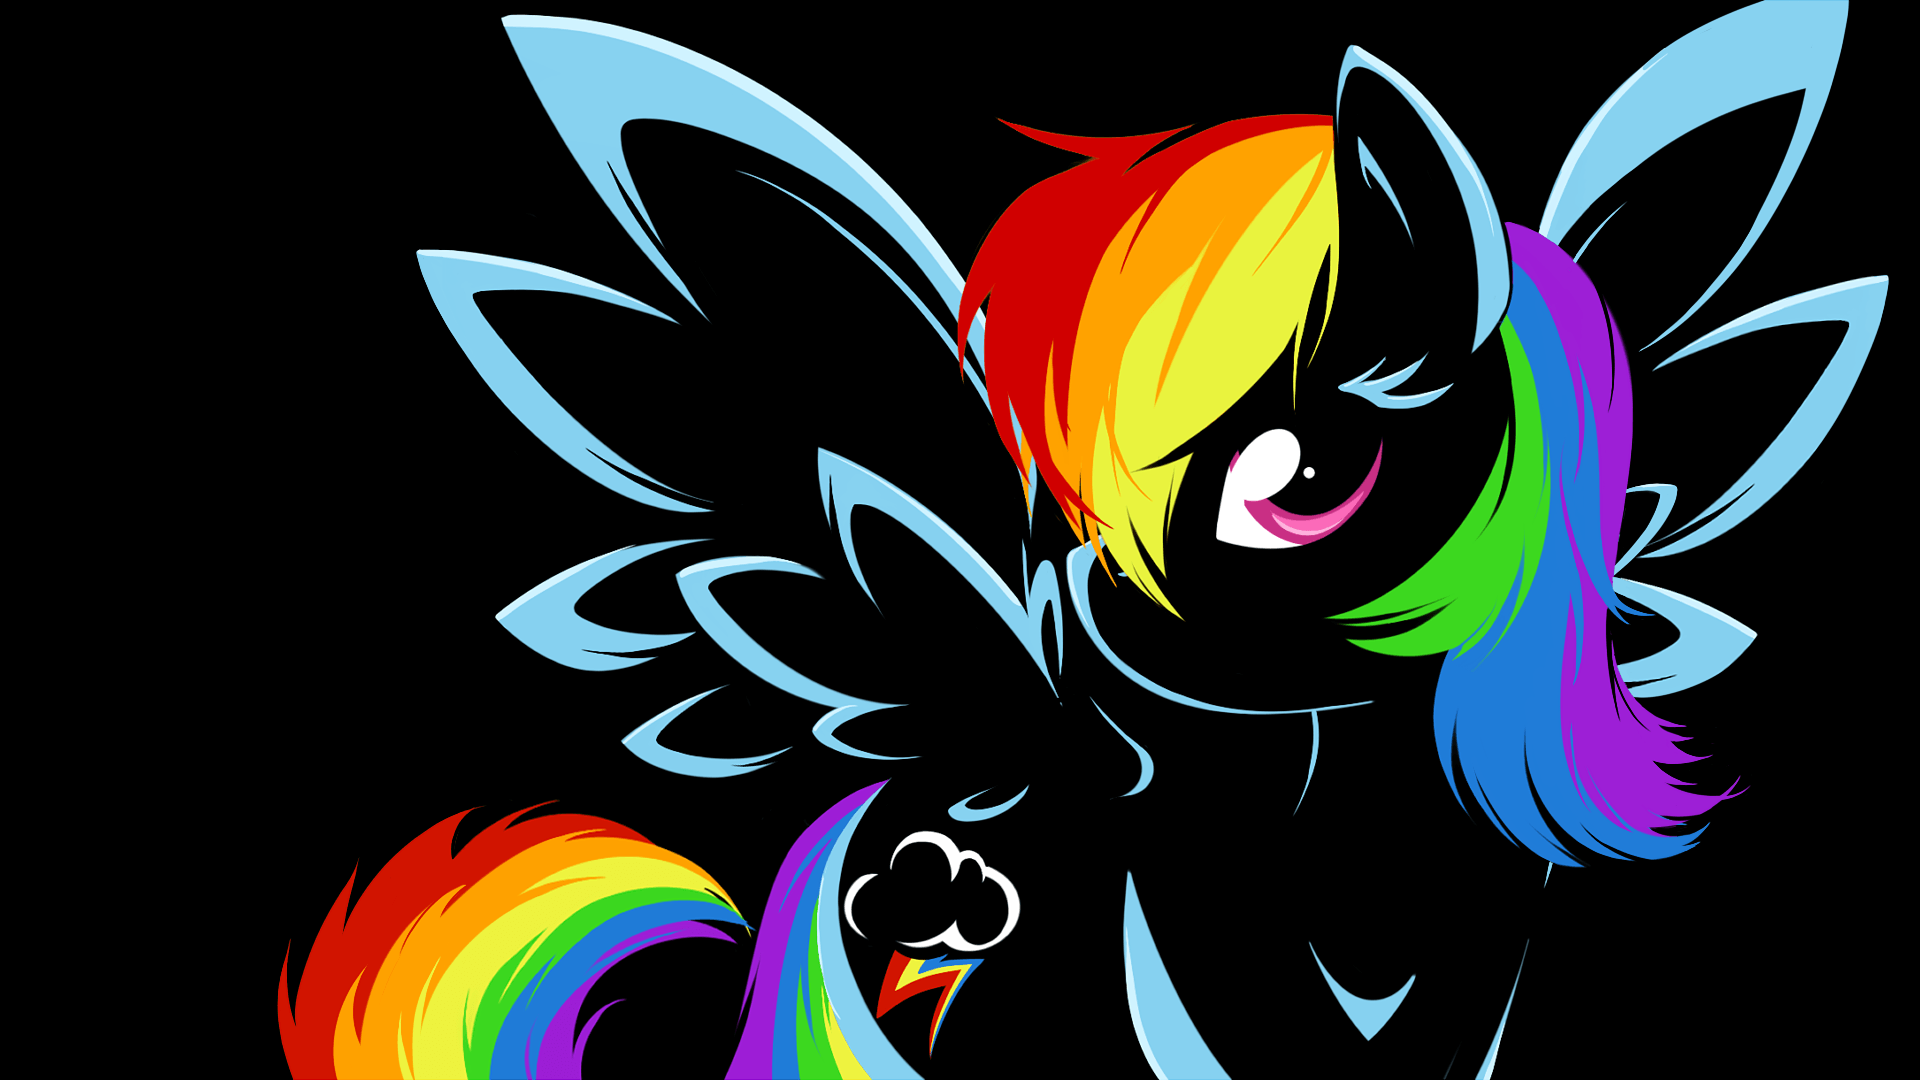 rainbow dash sphere background - photo #37